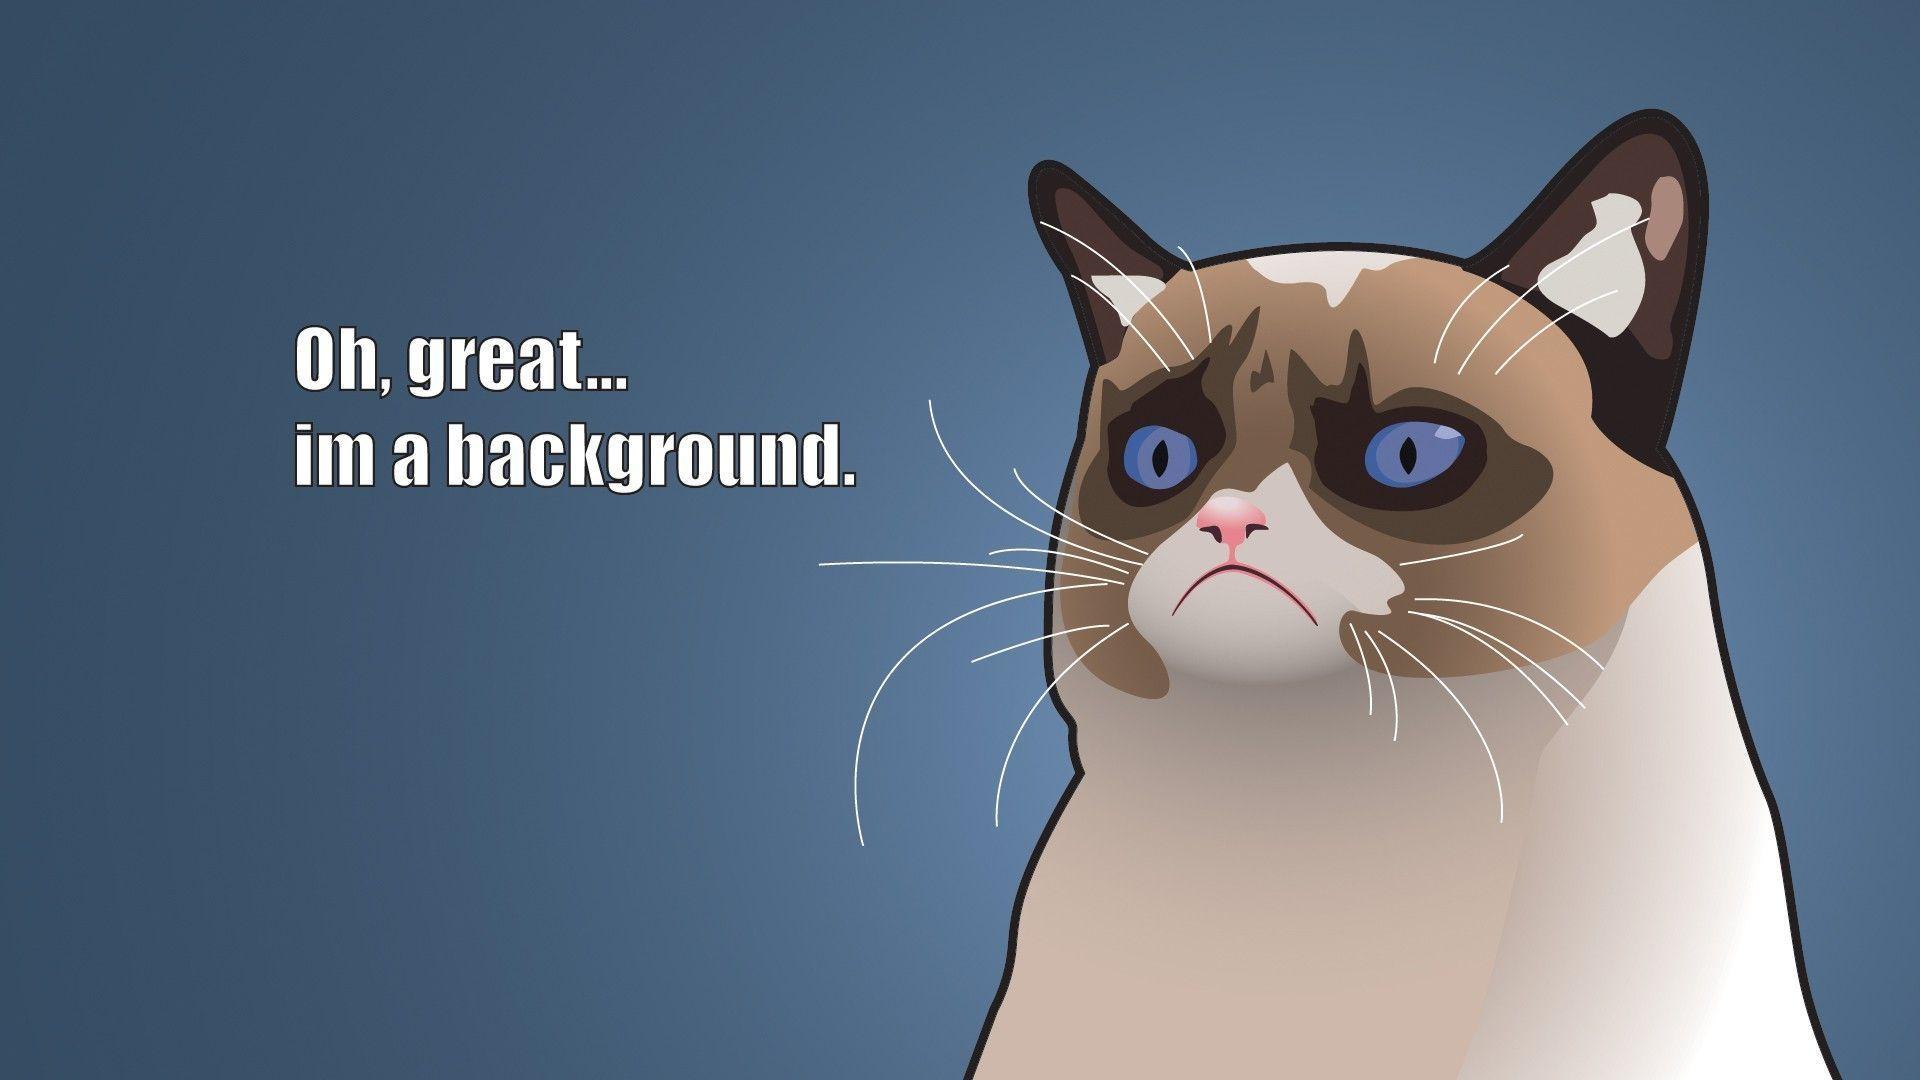 cartoon cat wallpaper – Funny Trends – Funny Trends